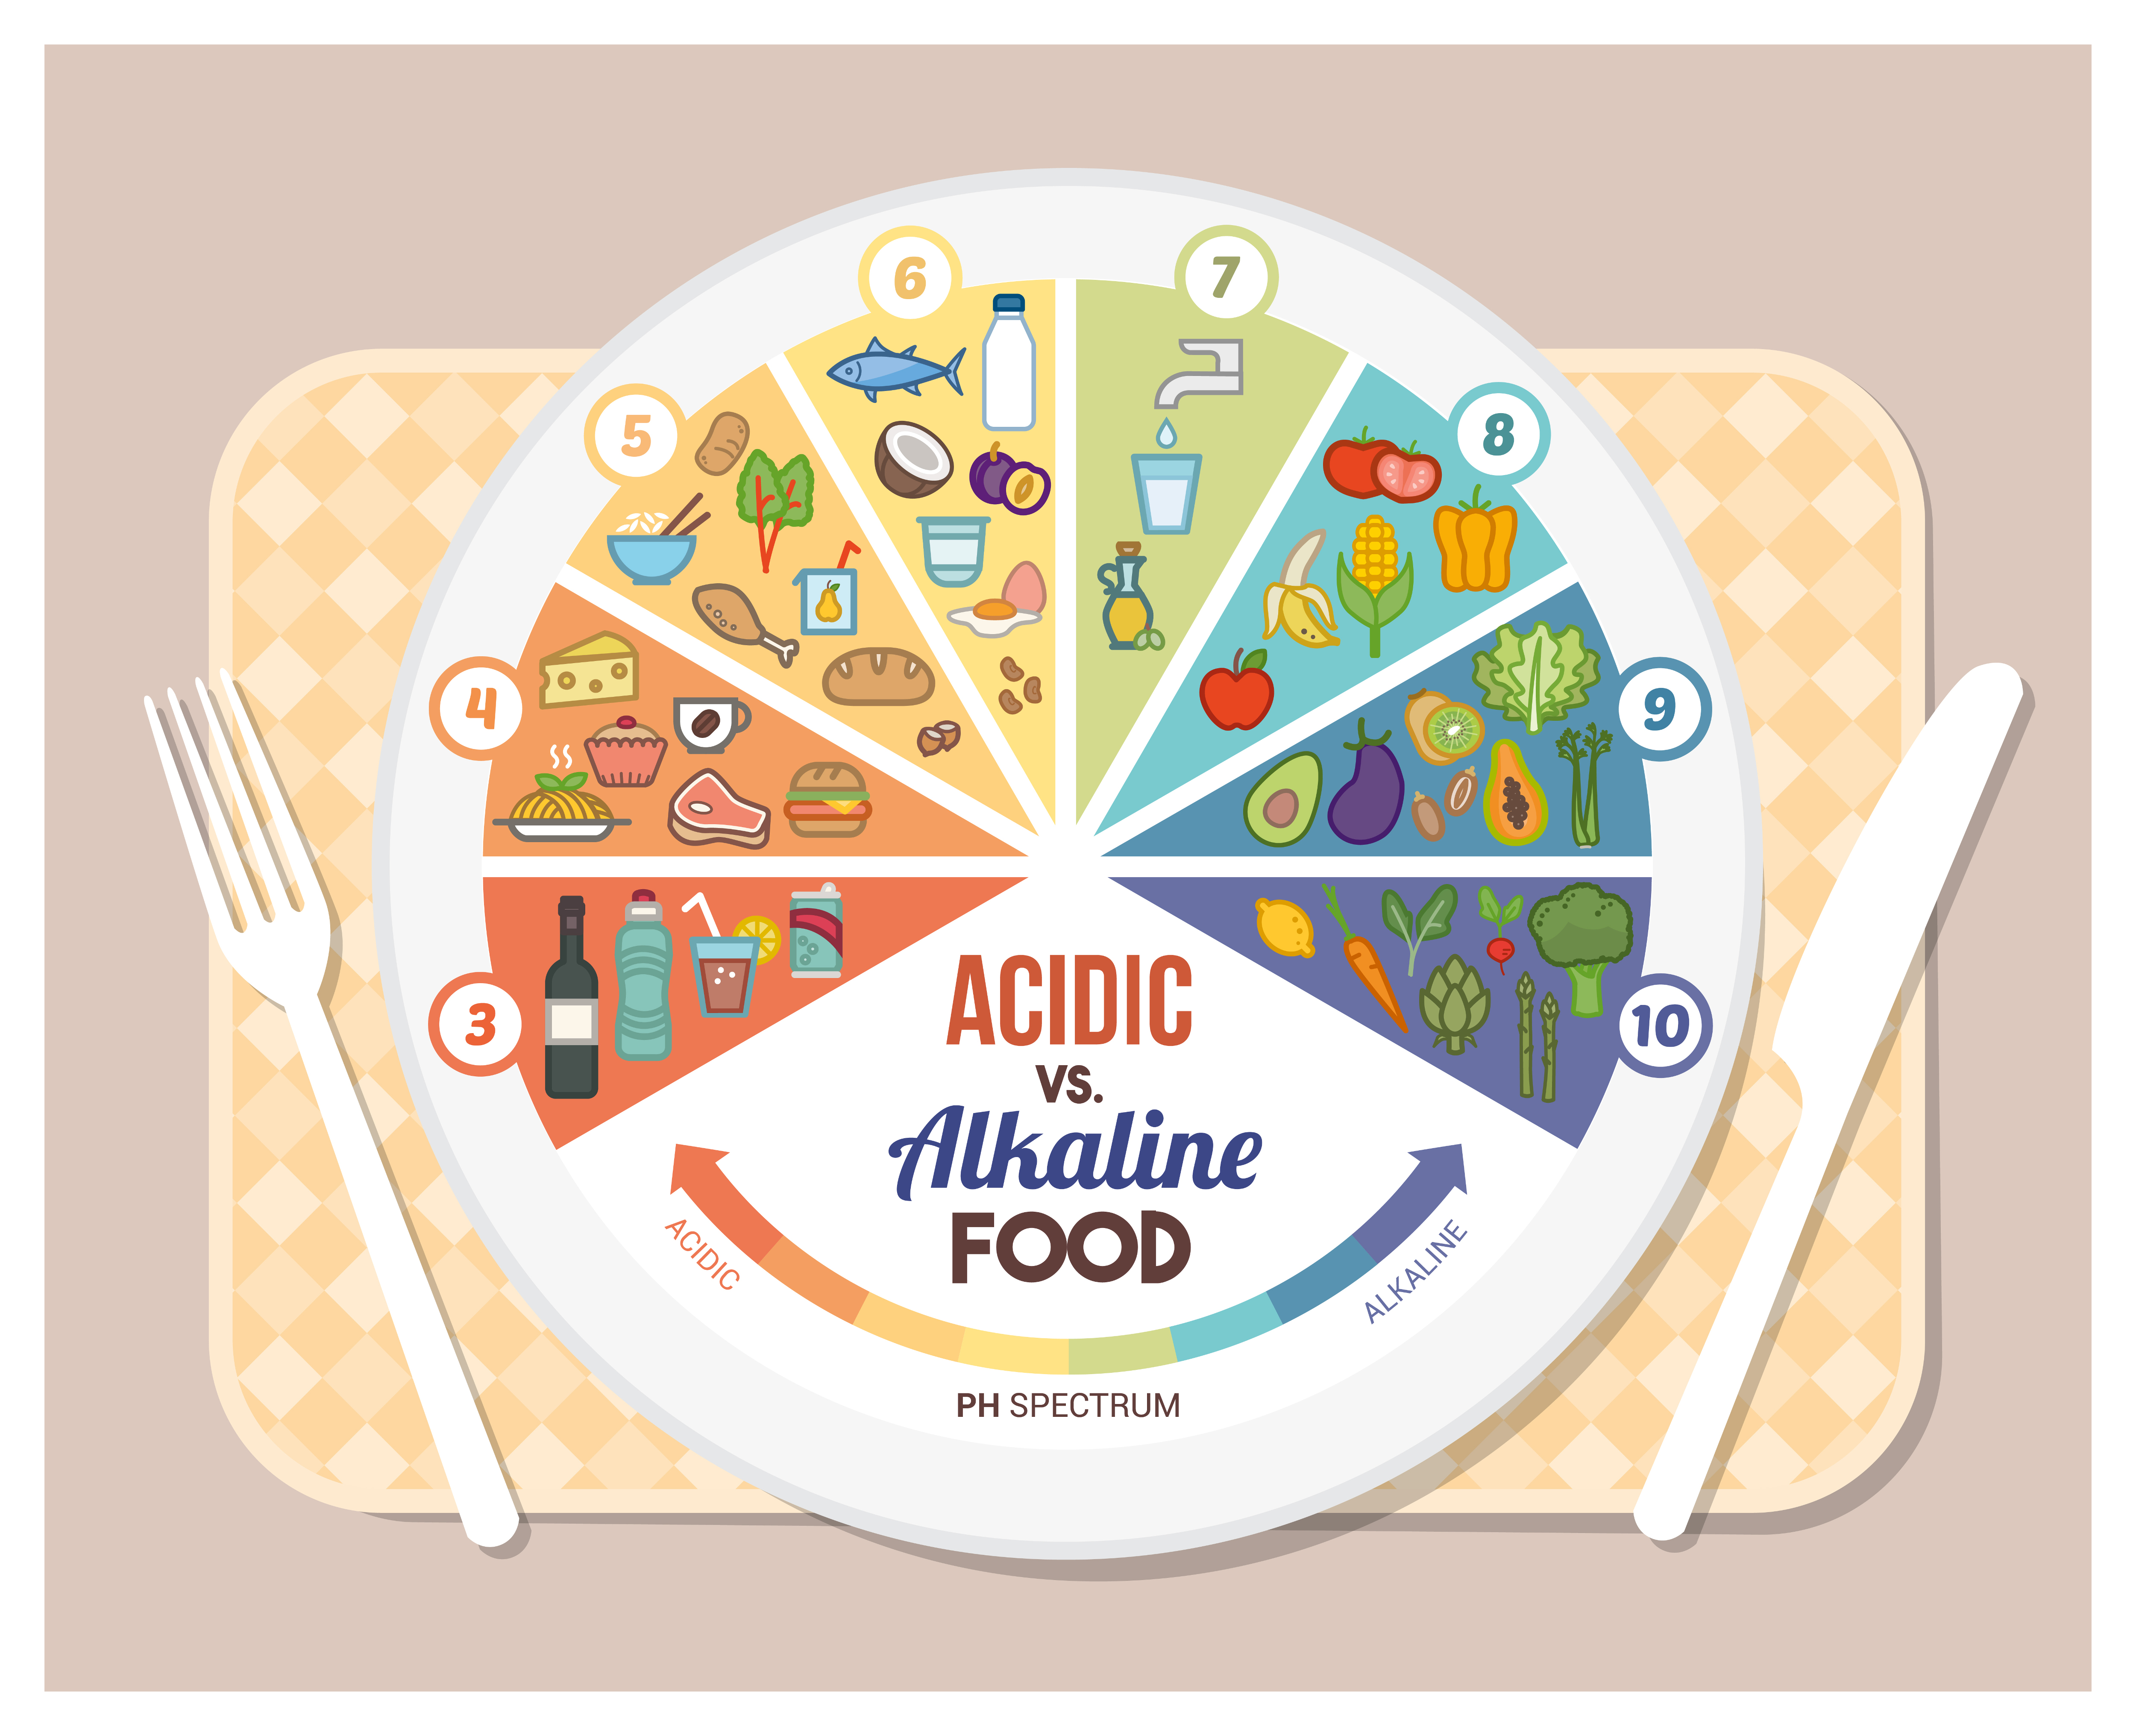 alkaline, diet, food